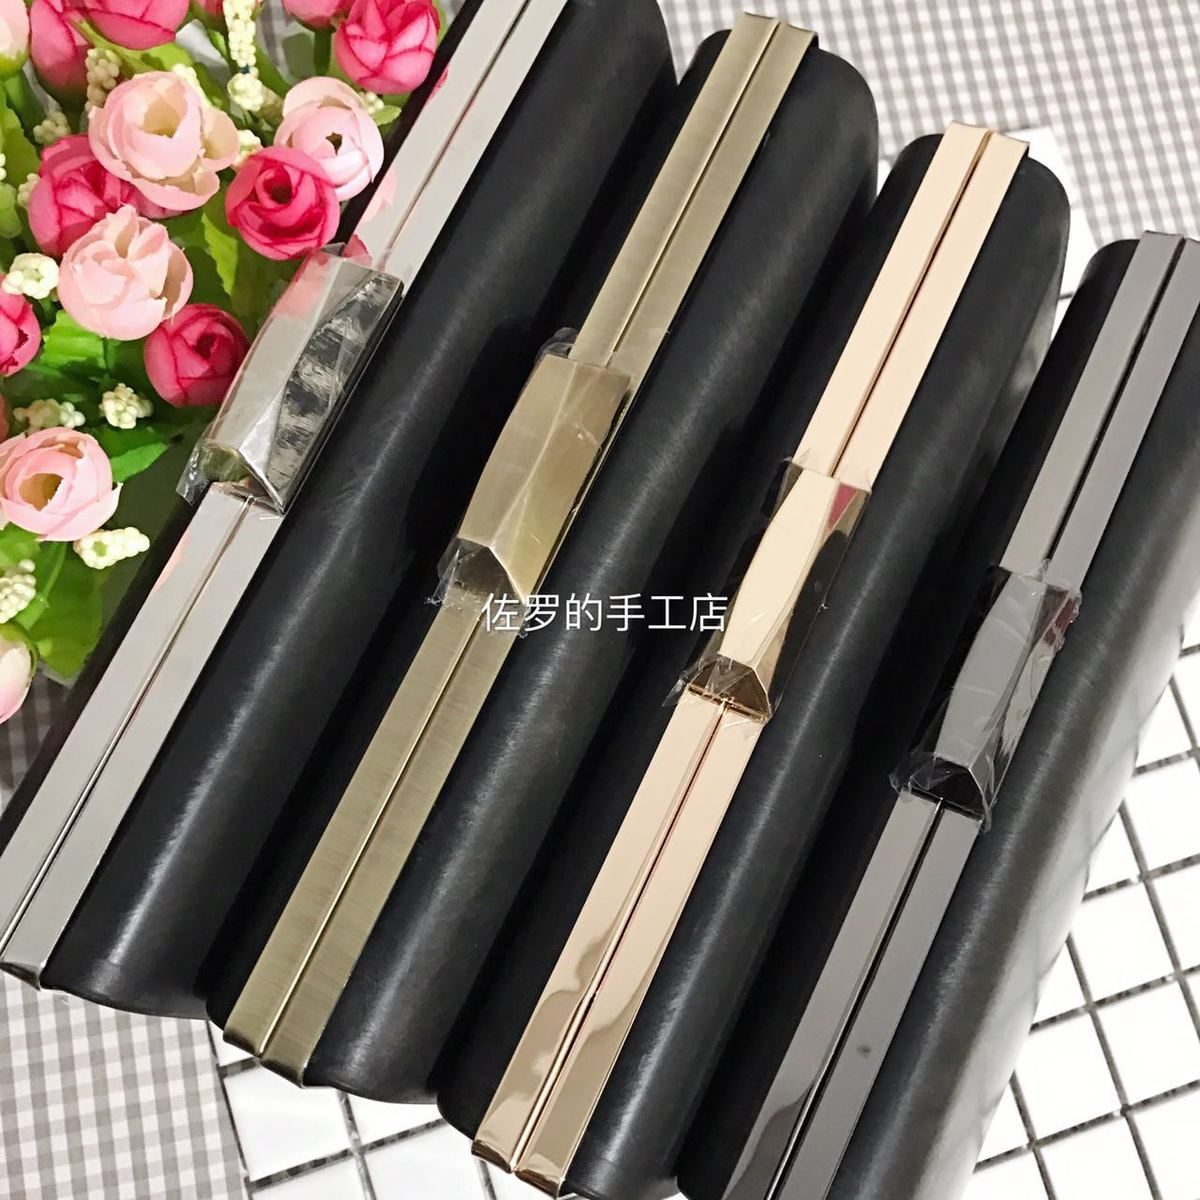 22 Cm Silver Gold Metal Pusr Frame With Black Plastic Box Wallet Purse Frame Diy Handbag Accessories Obag Handle